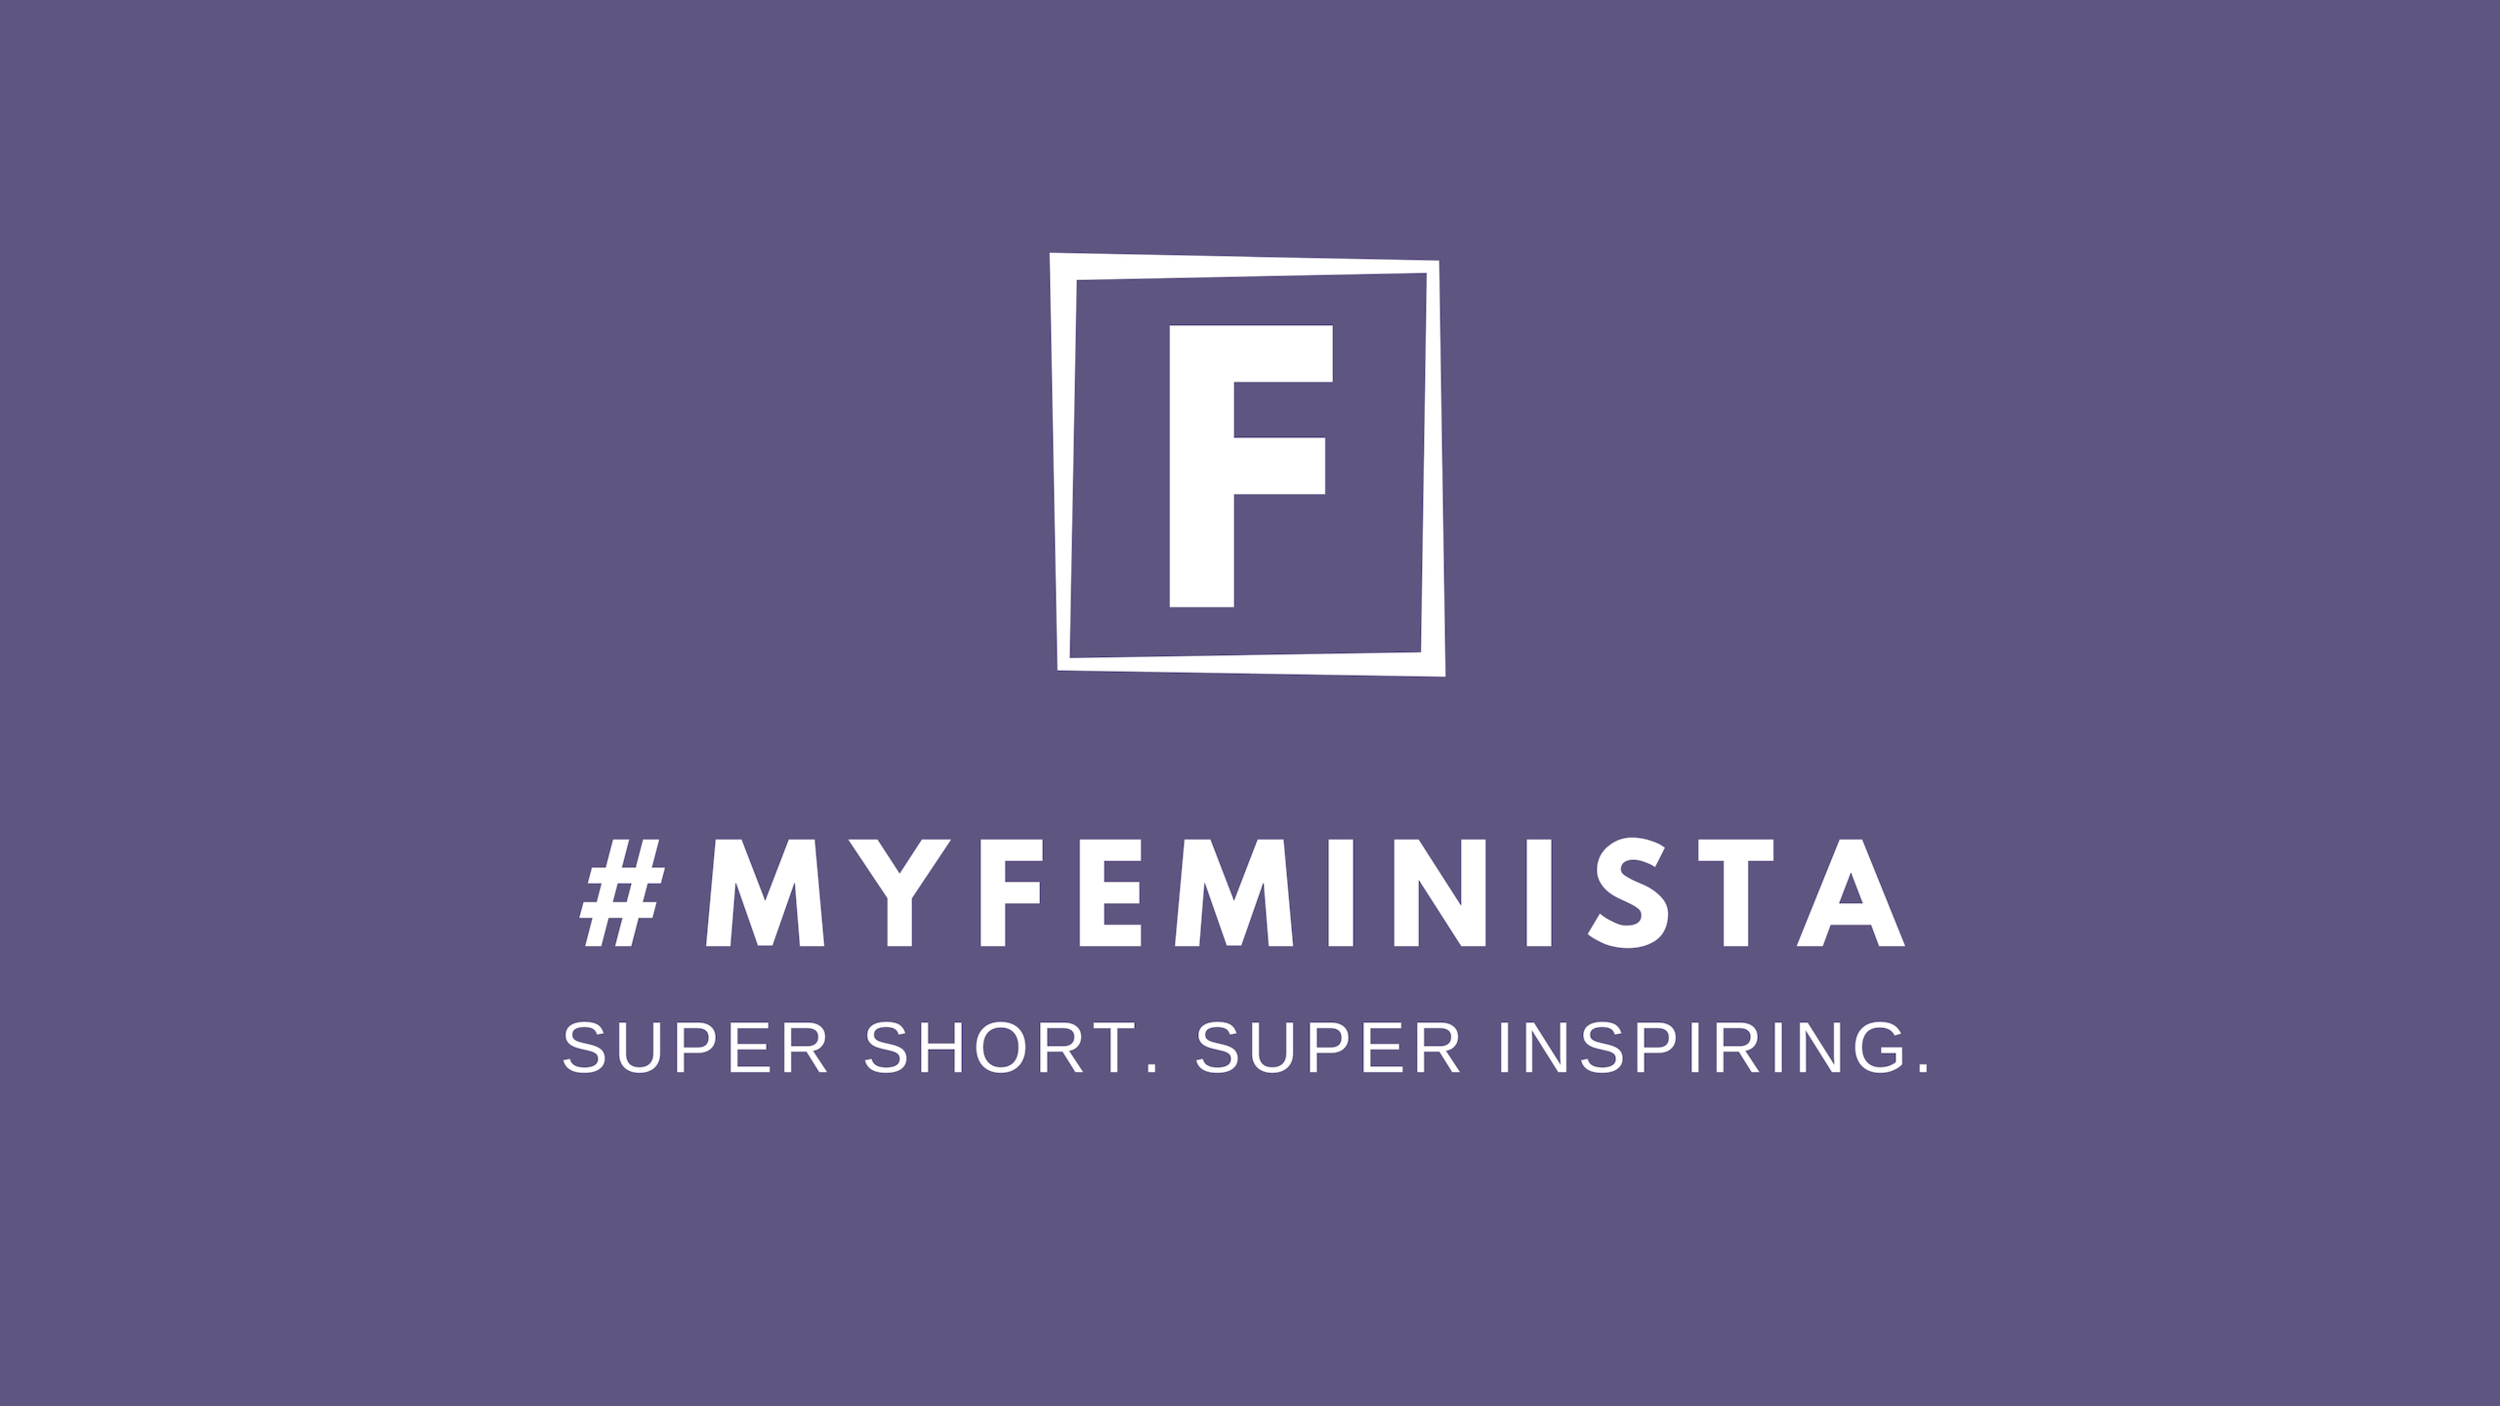 #myfeminista celebrates female role models through documentary film. super short, super inspiring